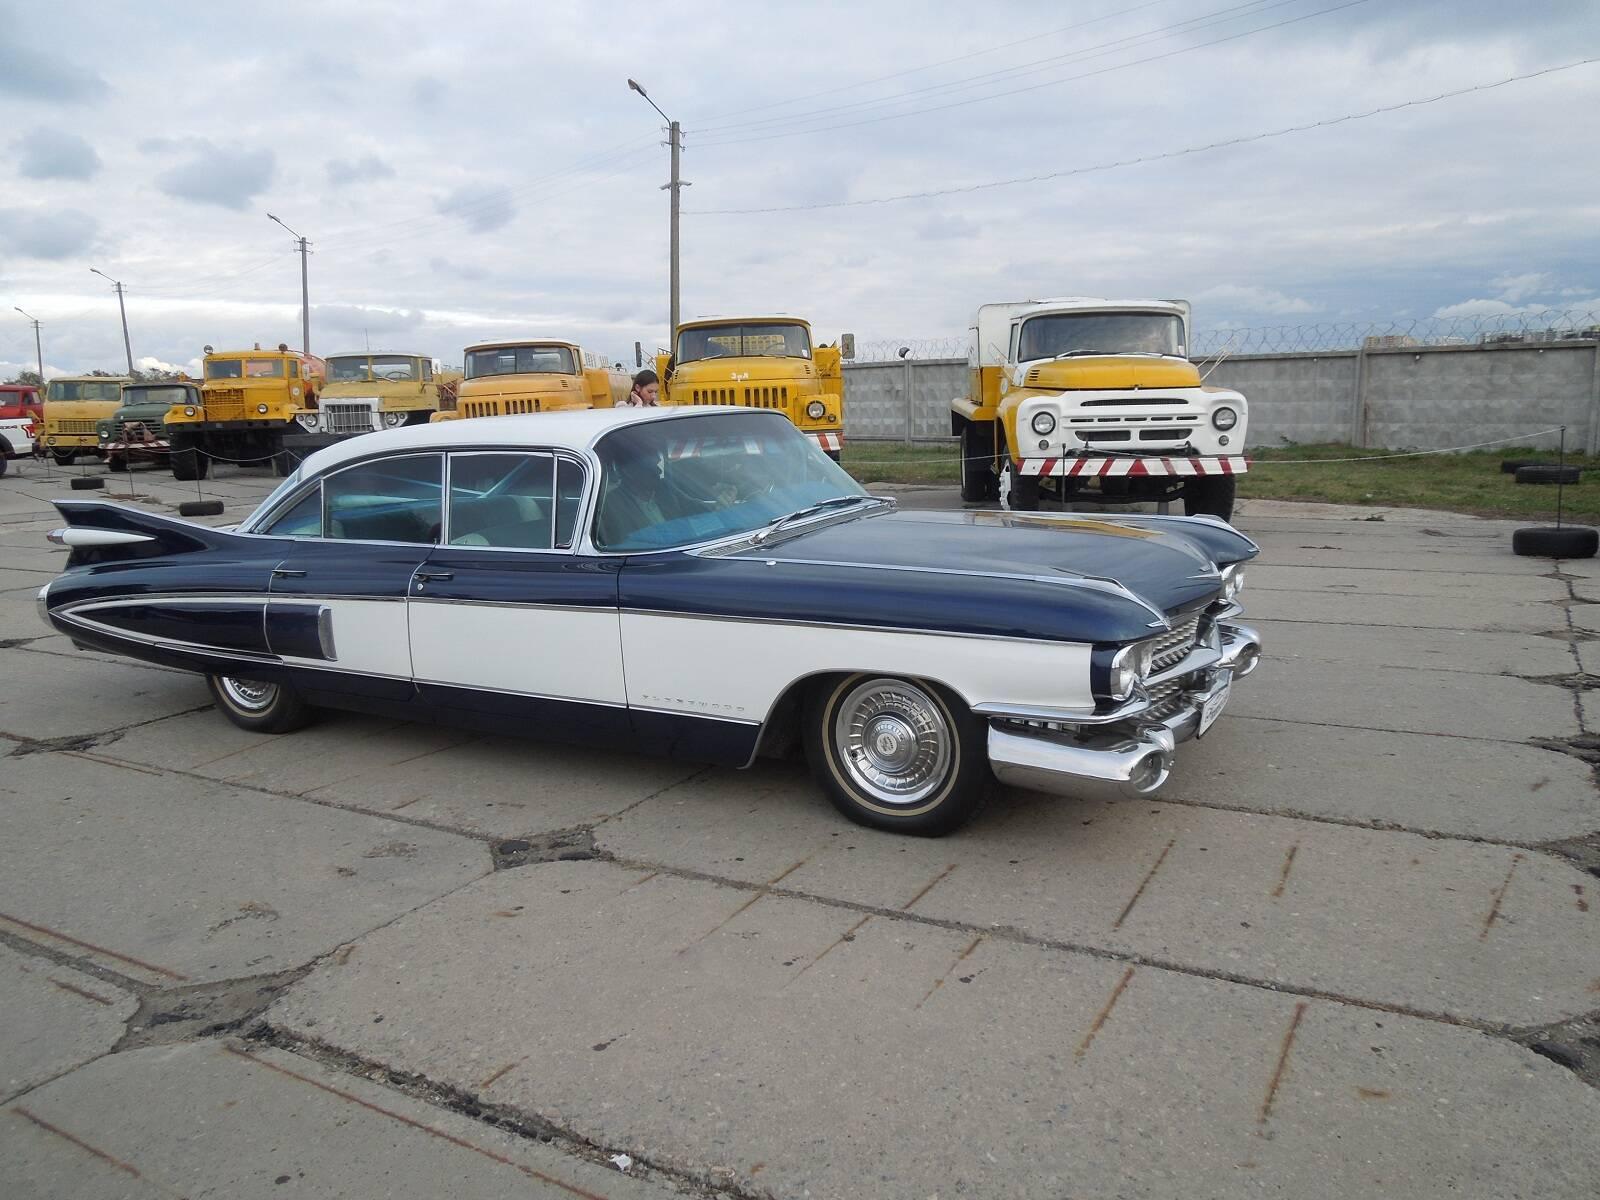 За Cadillac Fleetwood 1959 року просять серйозну суму.